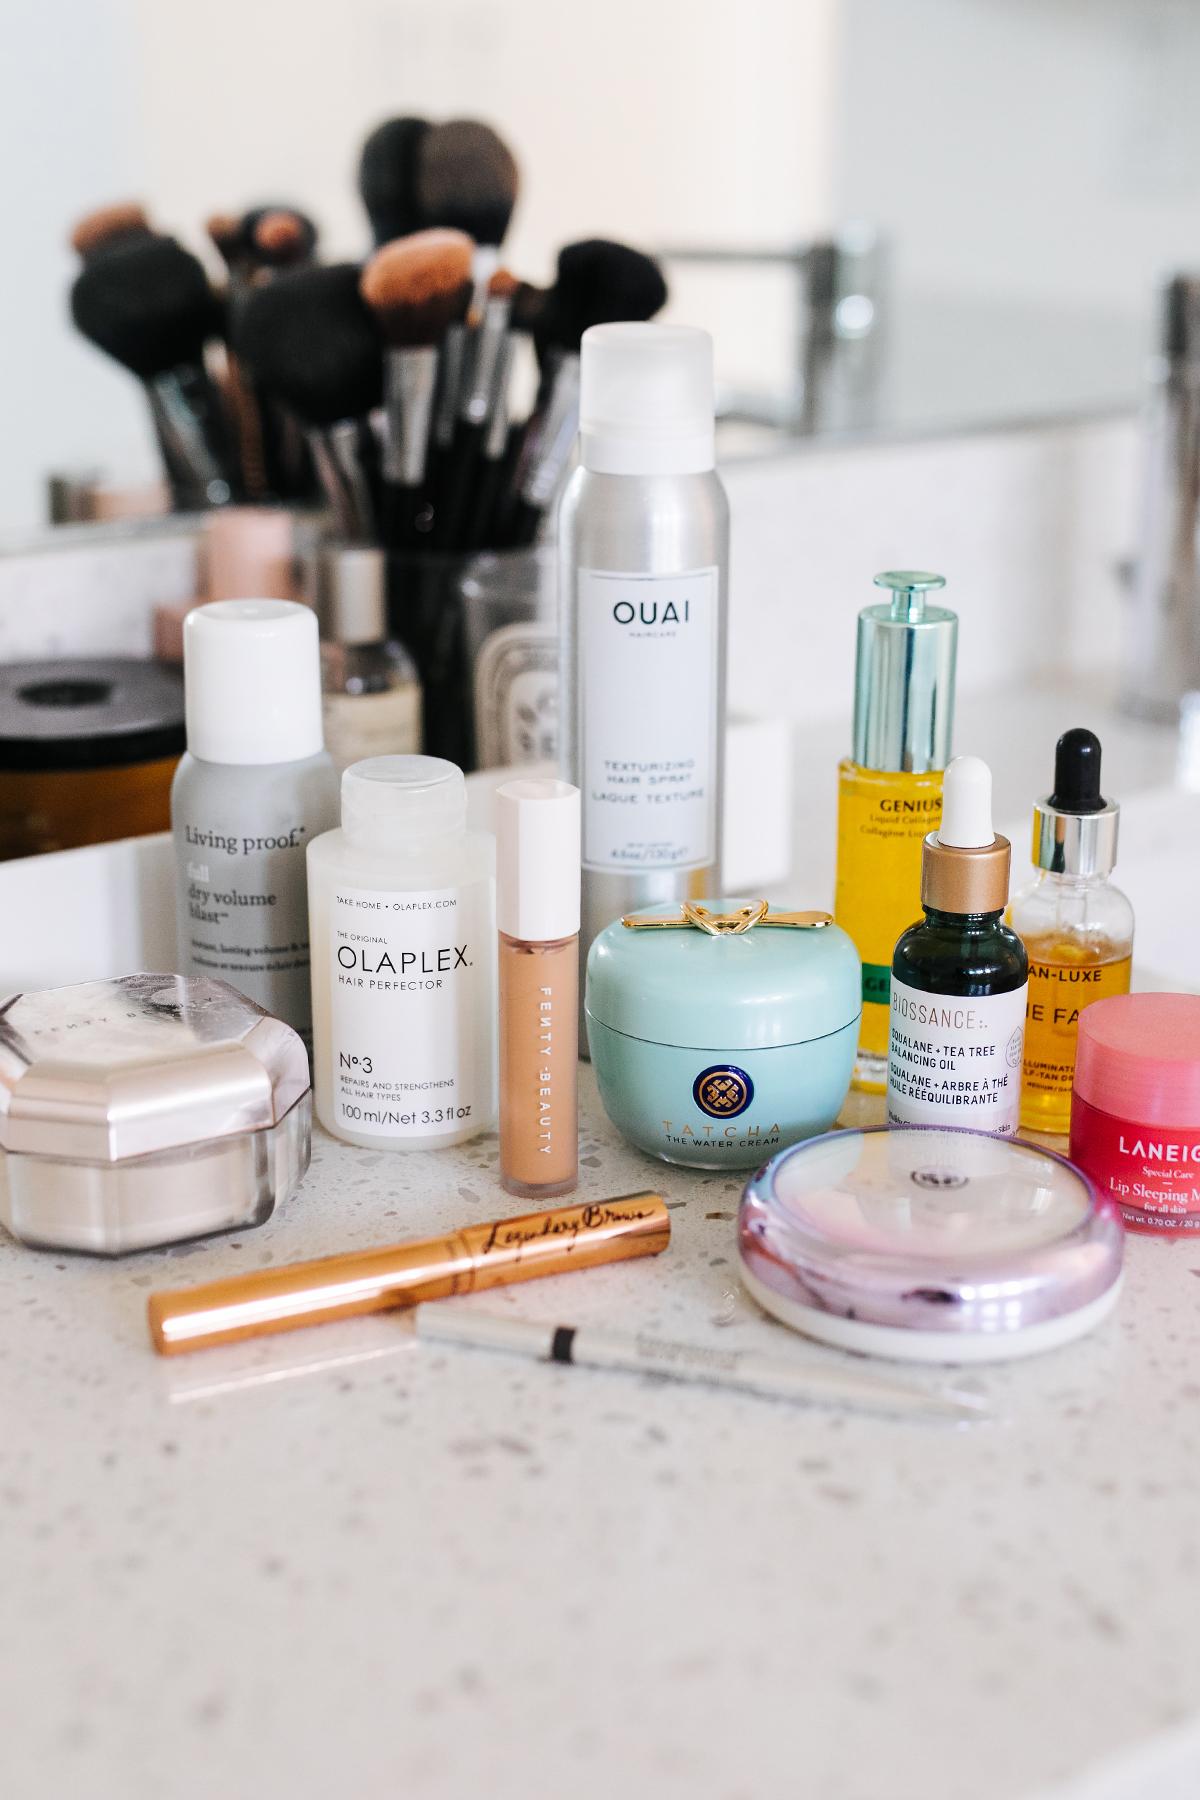 Sephora Beauty Insider Spring Event